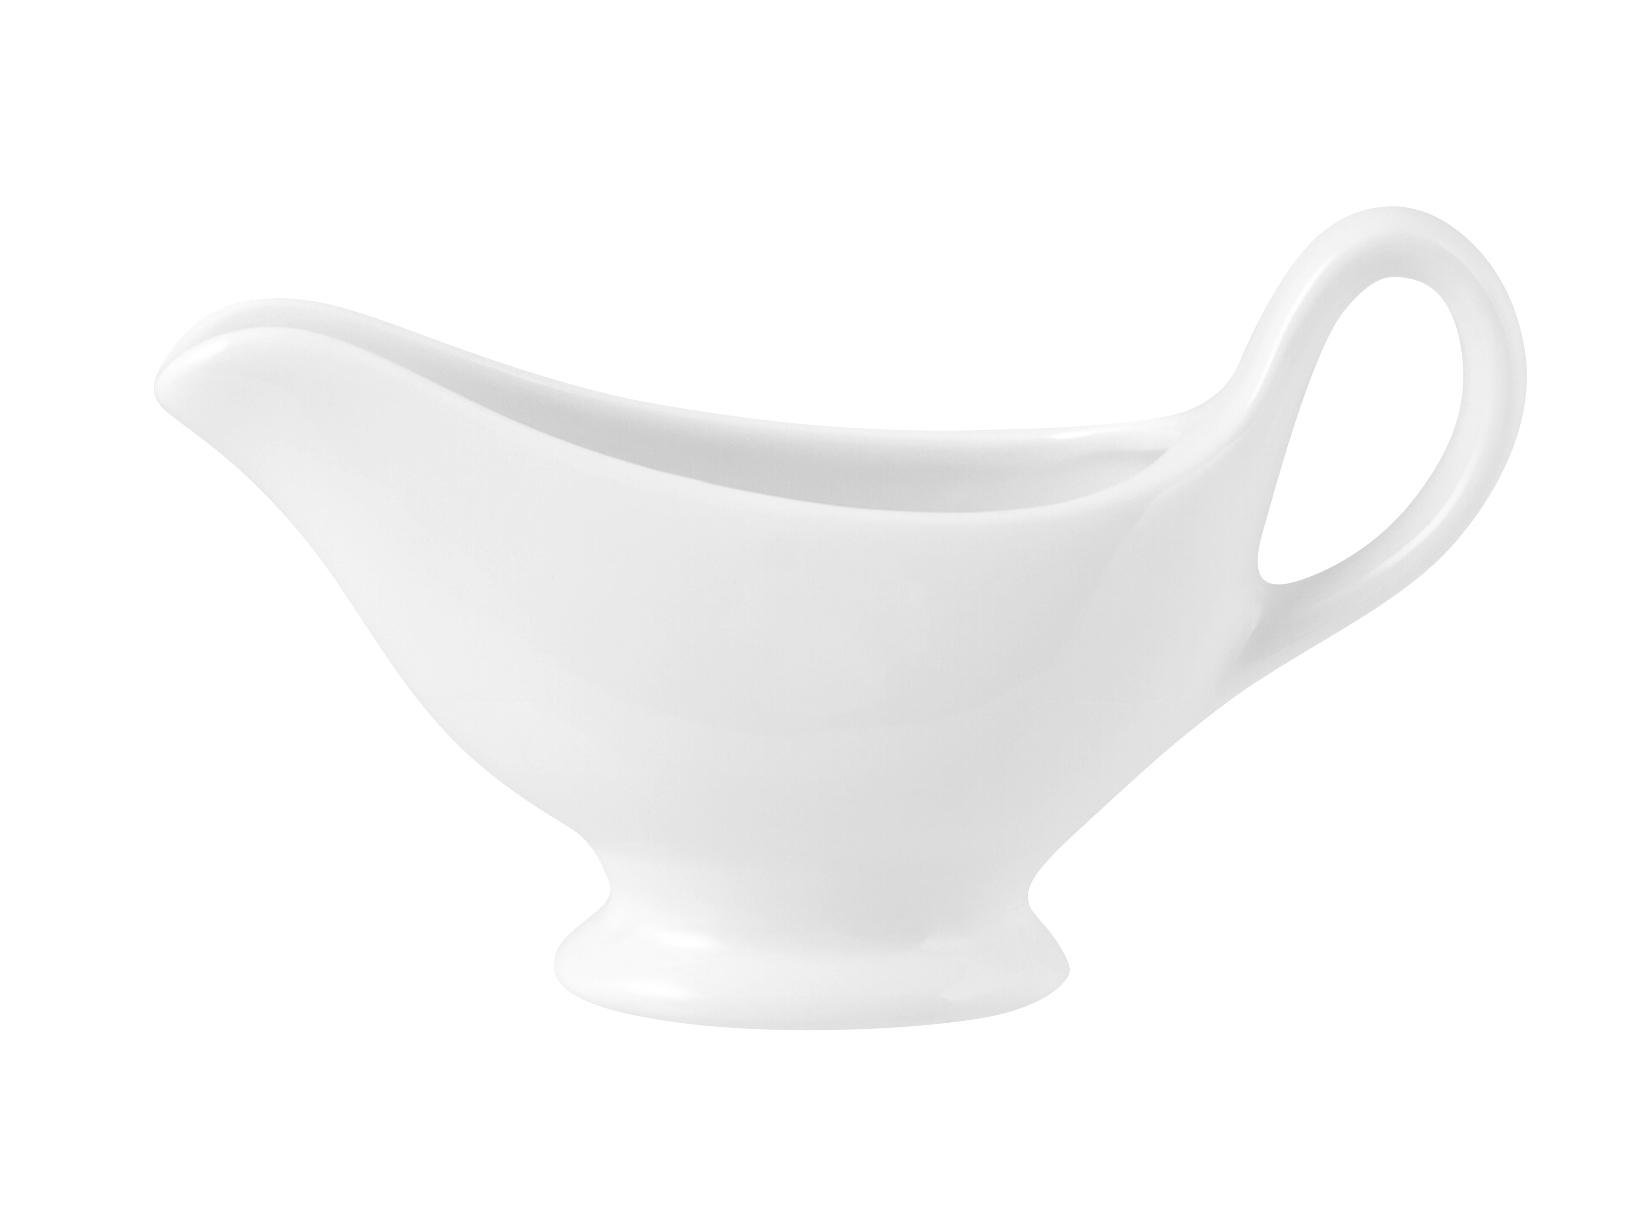 Acquista Salsiera Porcellana Cc180 Utensili 17527682 | Glooke.com